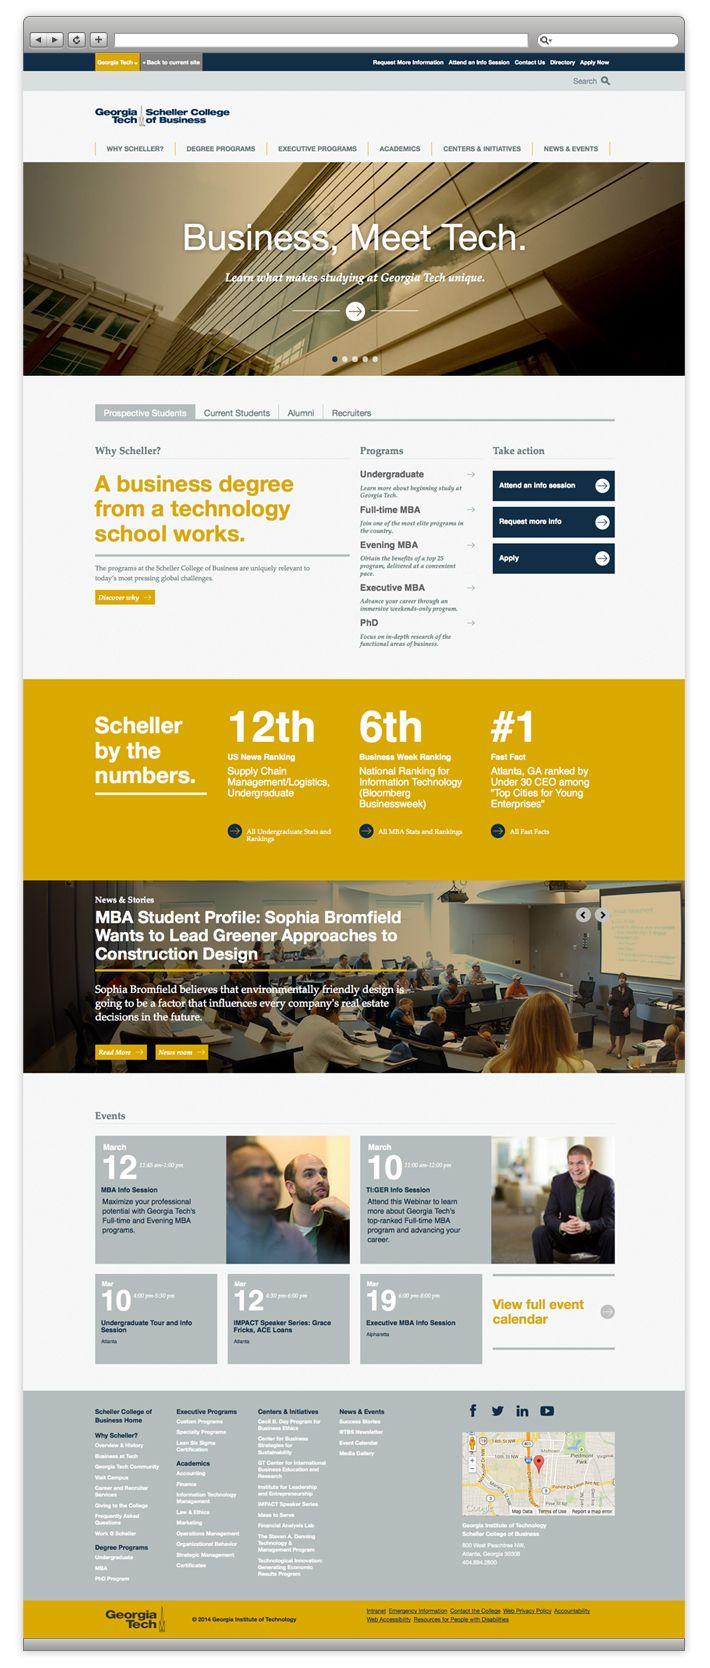 Georgia Tech Scheller College Of Business Website Redesign School Technology Website Redesign Mba Student